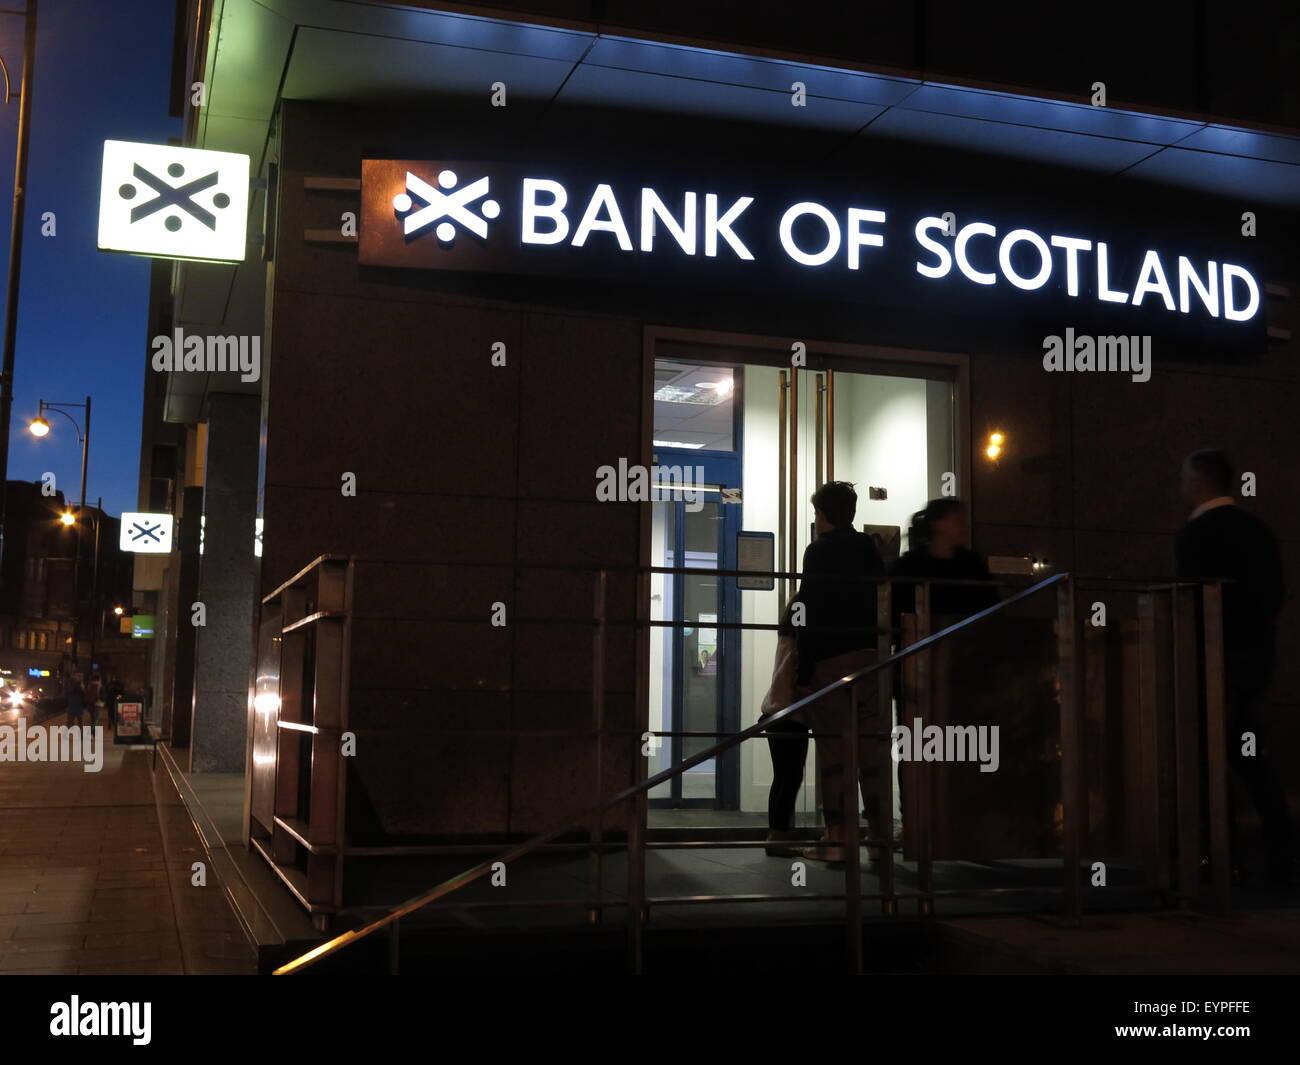 Bank of Scotland branch at night, with few lights on,Edinburgh,Scotland,UK Stock Photo